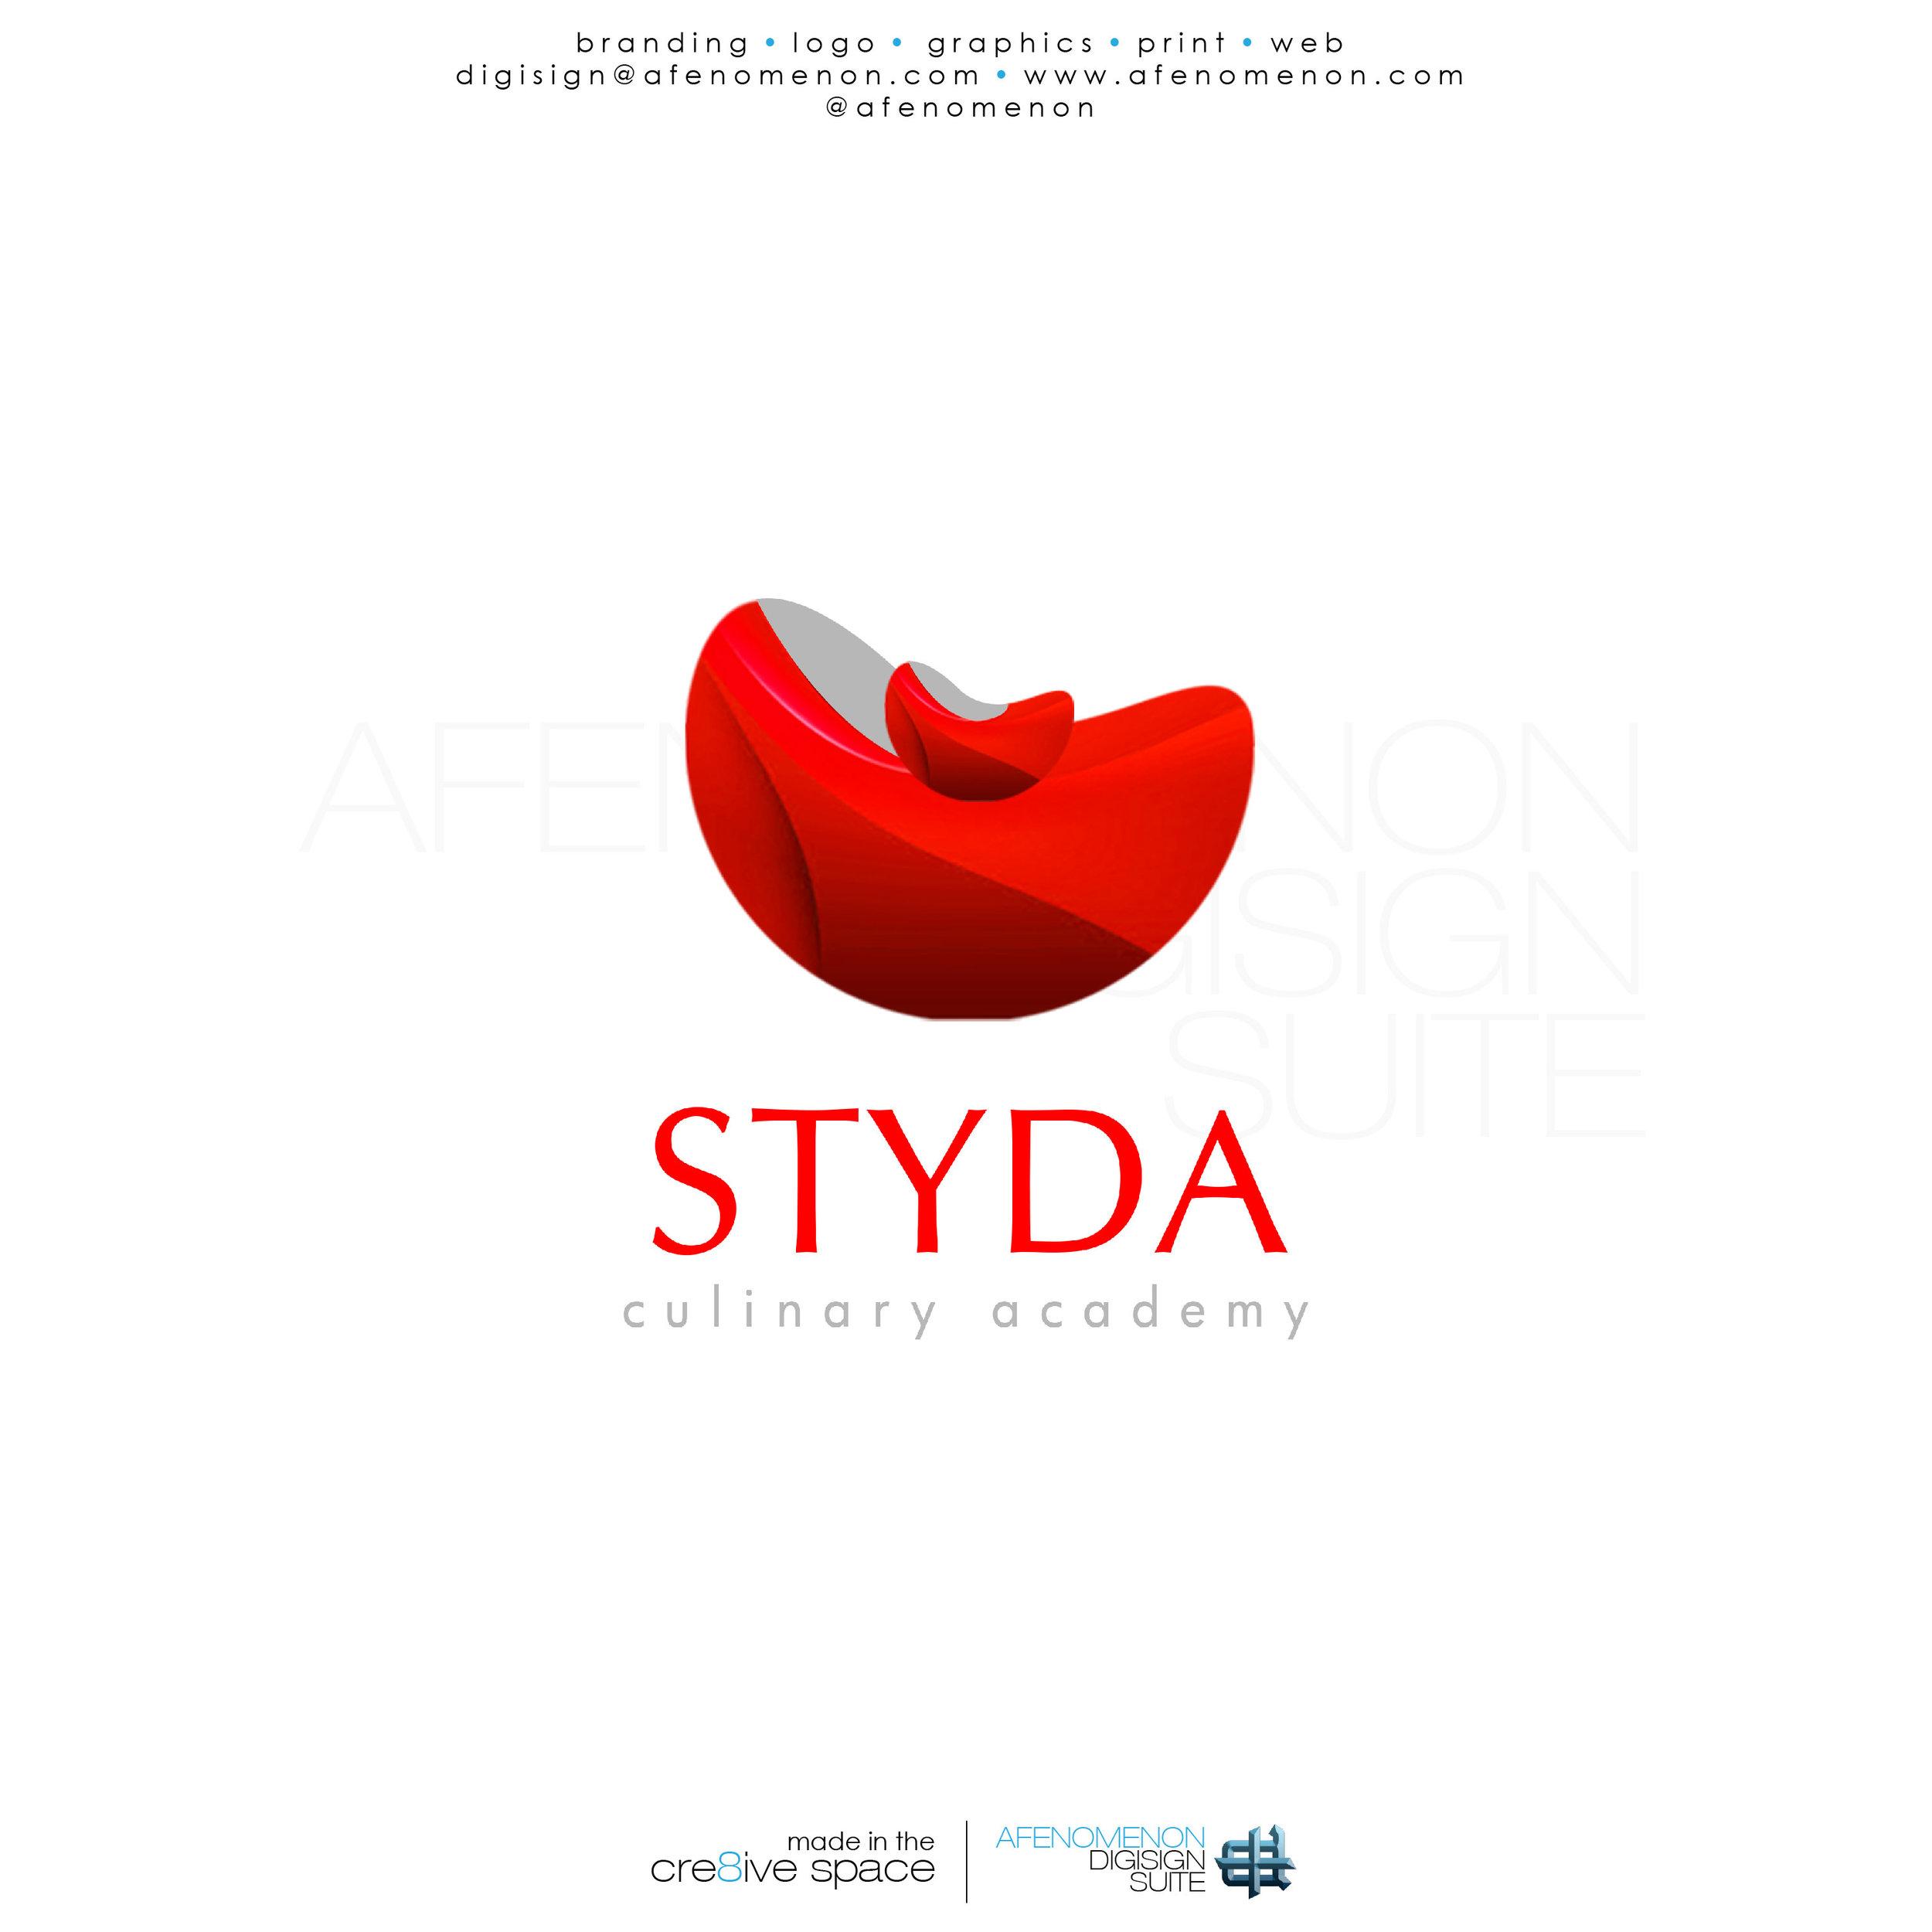 STYDA.jpg